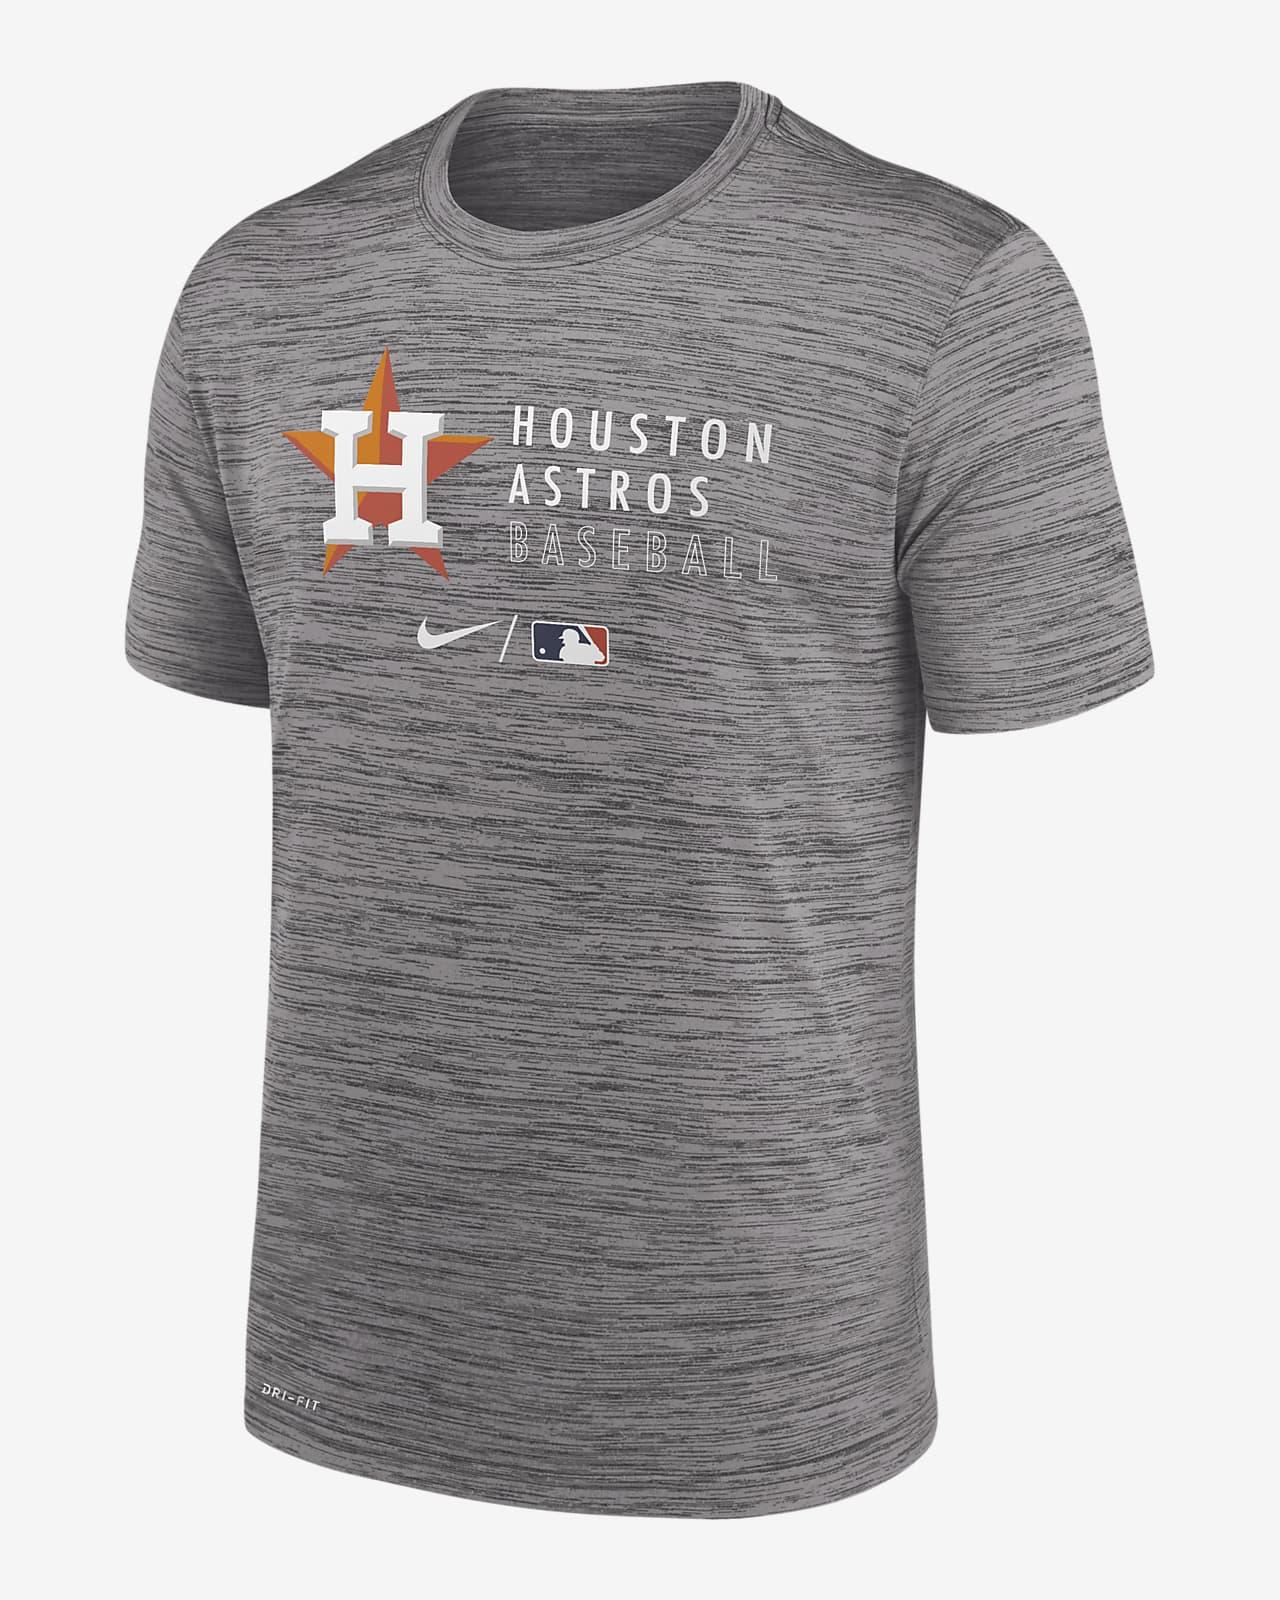 Playera para hombre Nike Dri-FIT Velocity Practice (MLB Houston Astros)